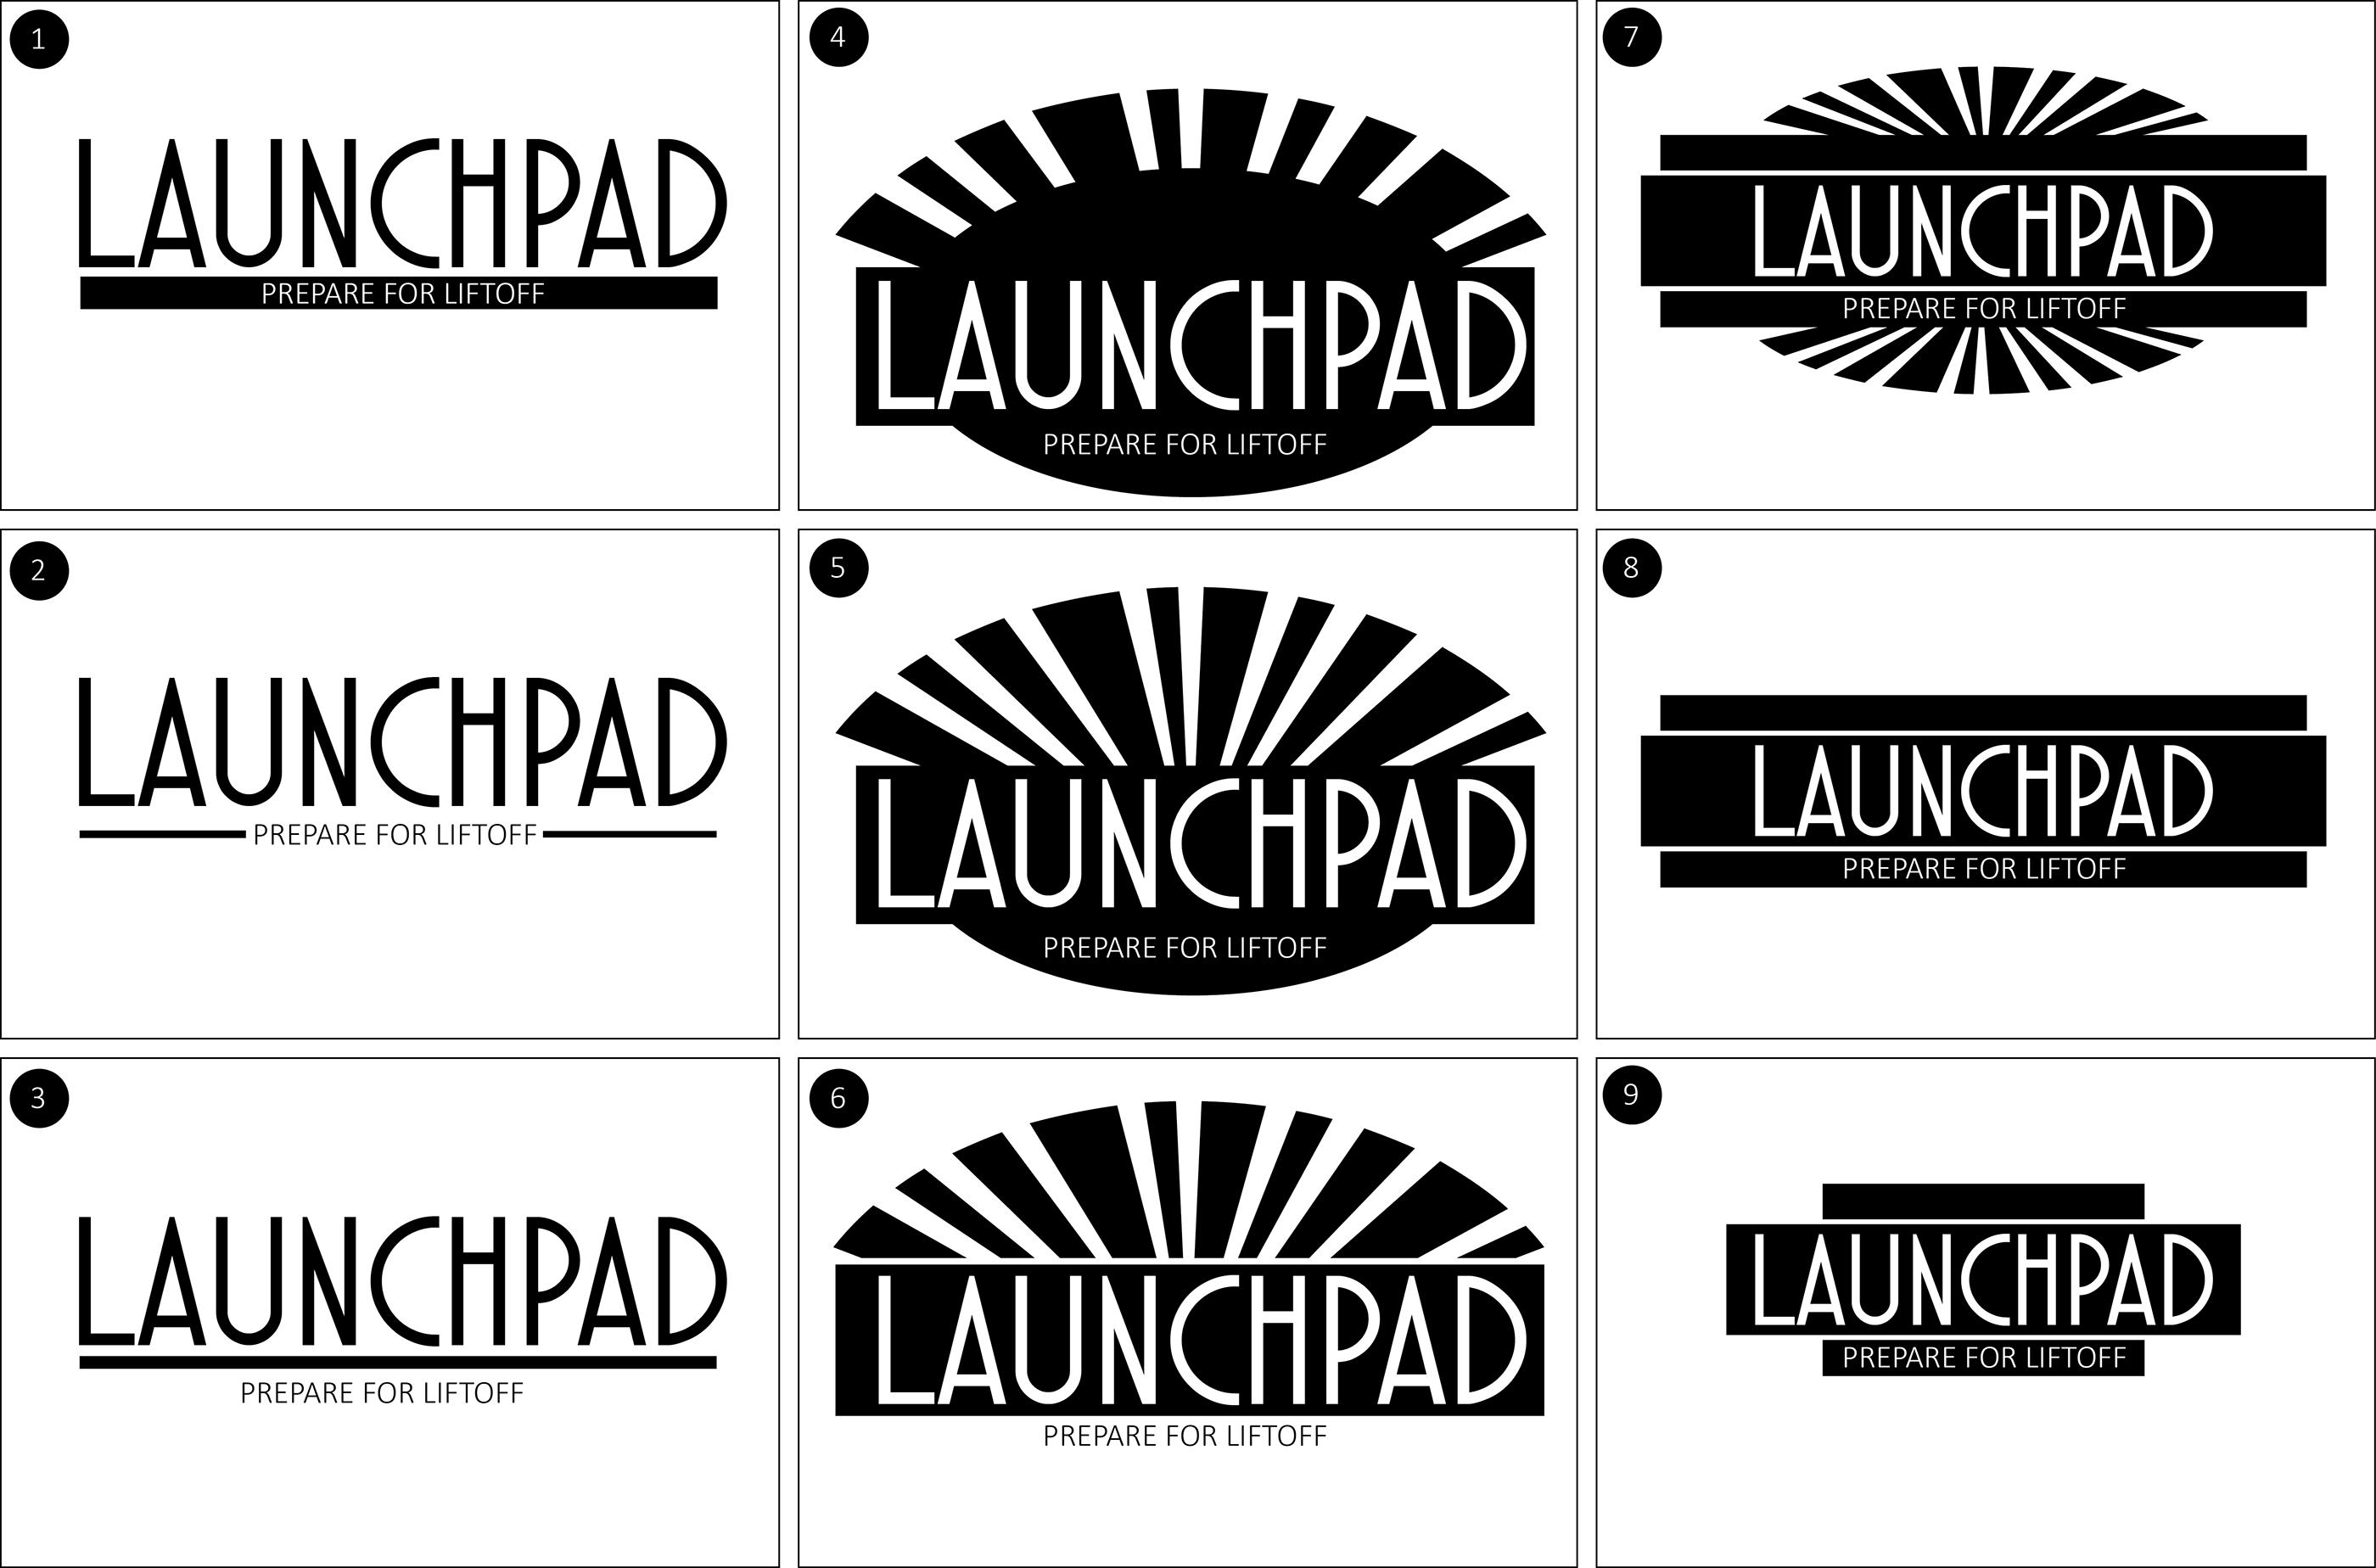 Launchpad on Behance